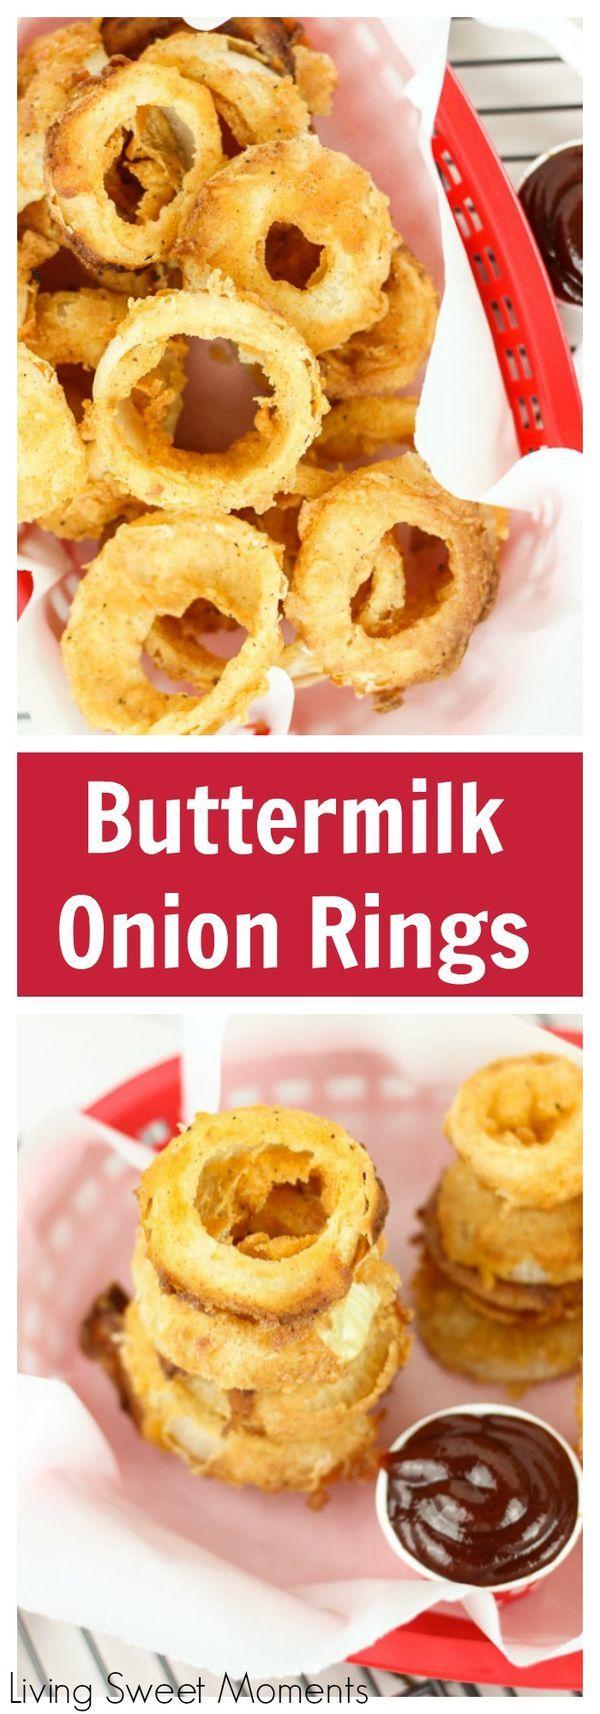 buttermilk buttermilk recipes buttermilk onion rings vegetable onion ...